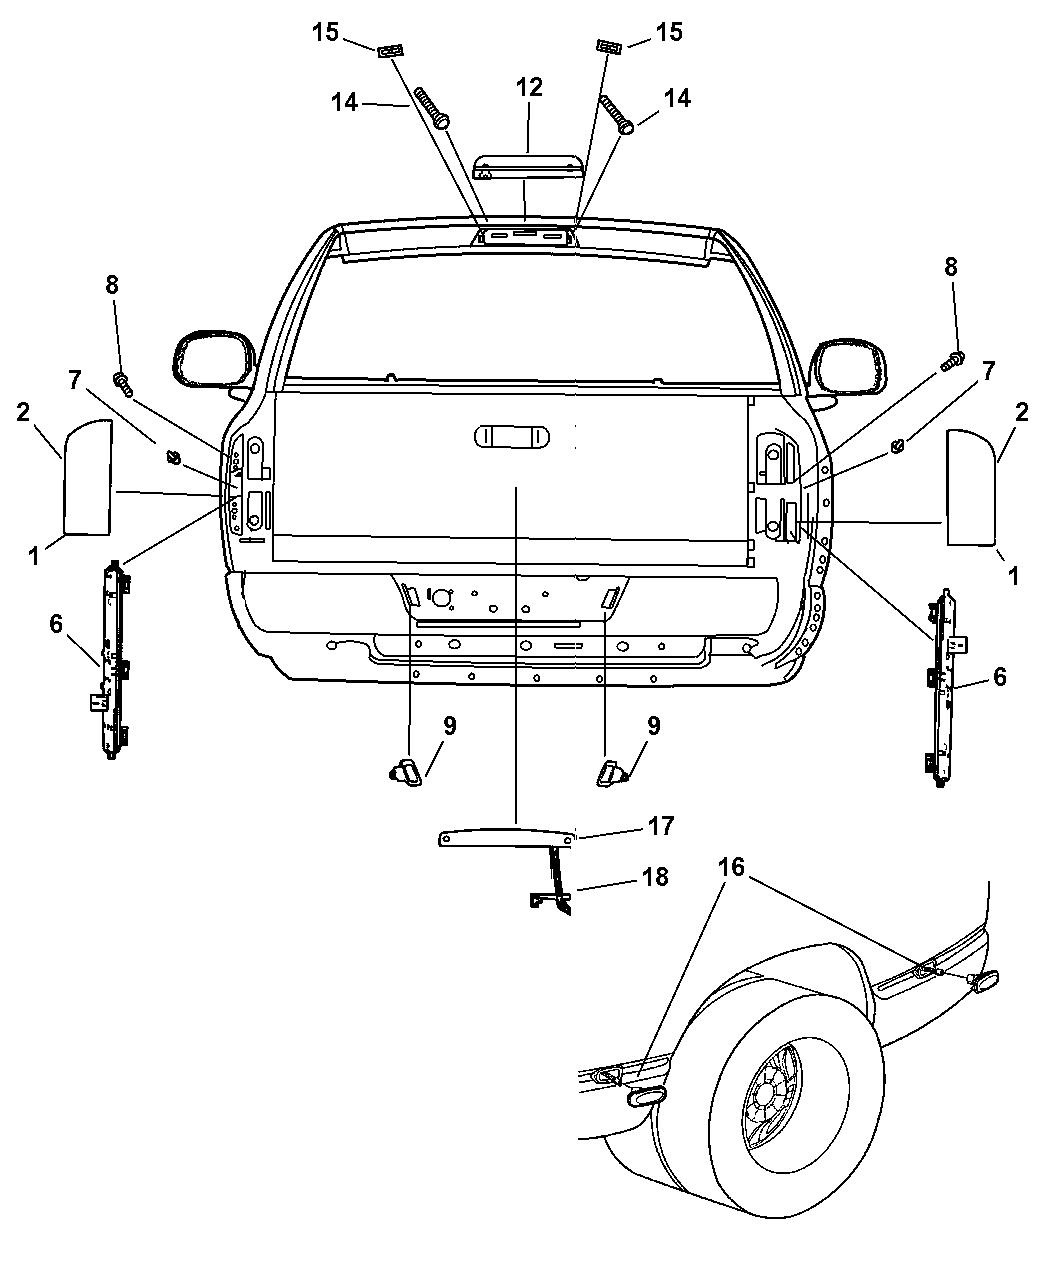 2005 Dodge Ram Tail Light Parts Diagram Wiring Diagram Photos For